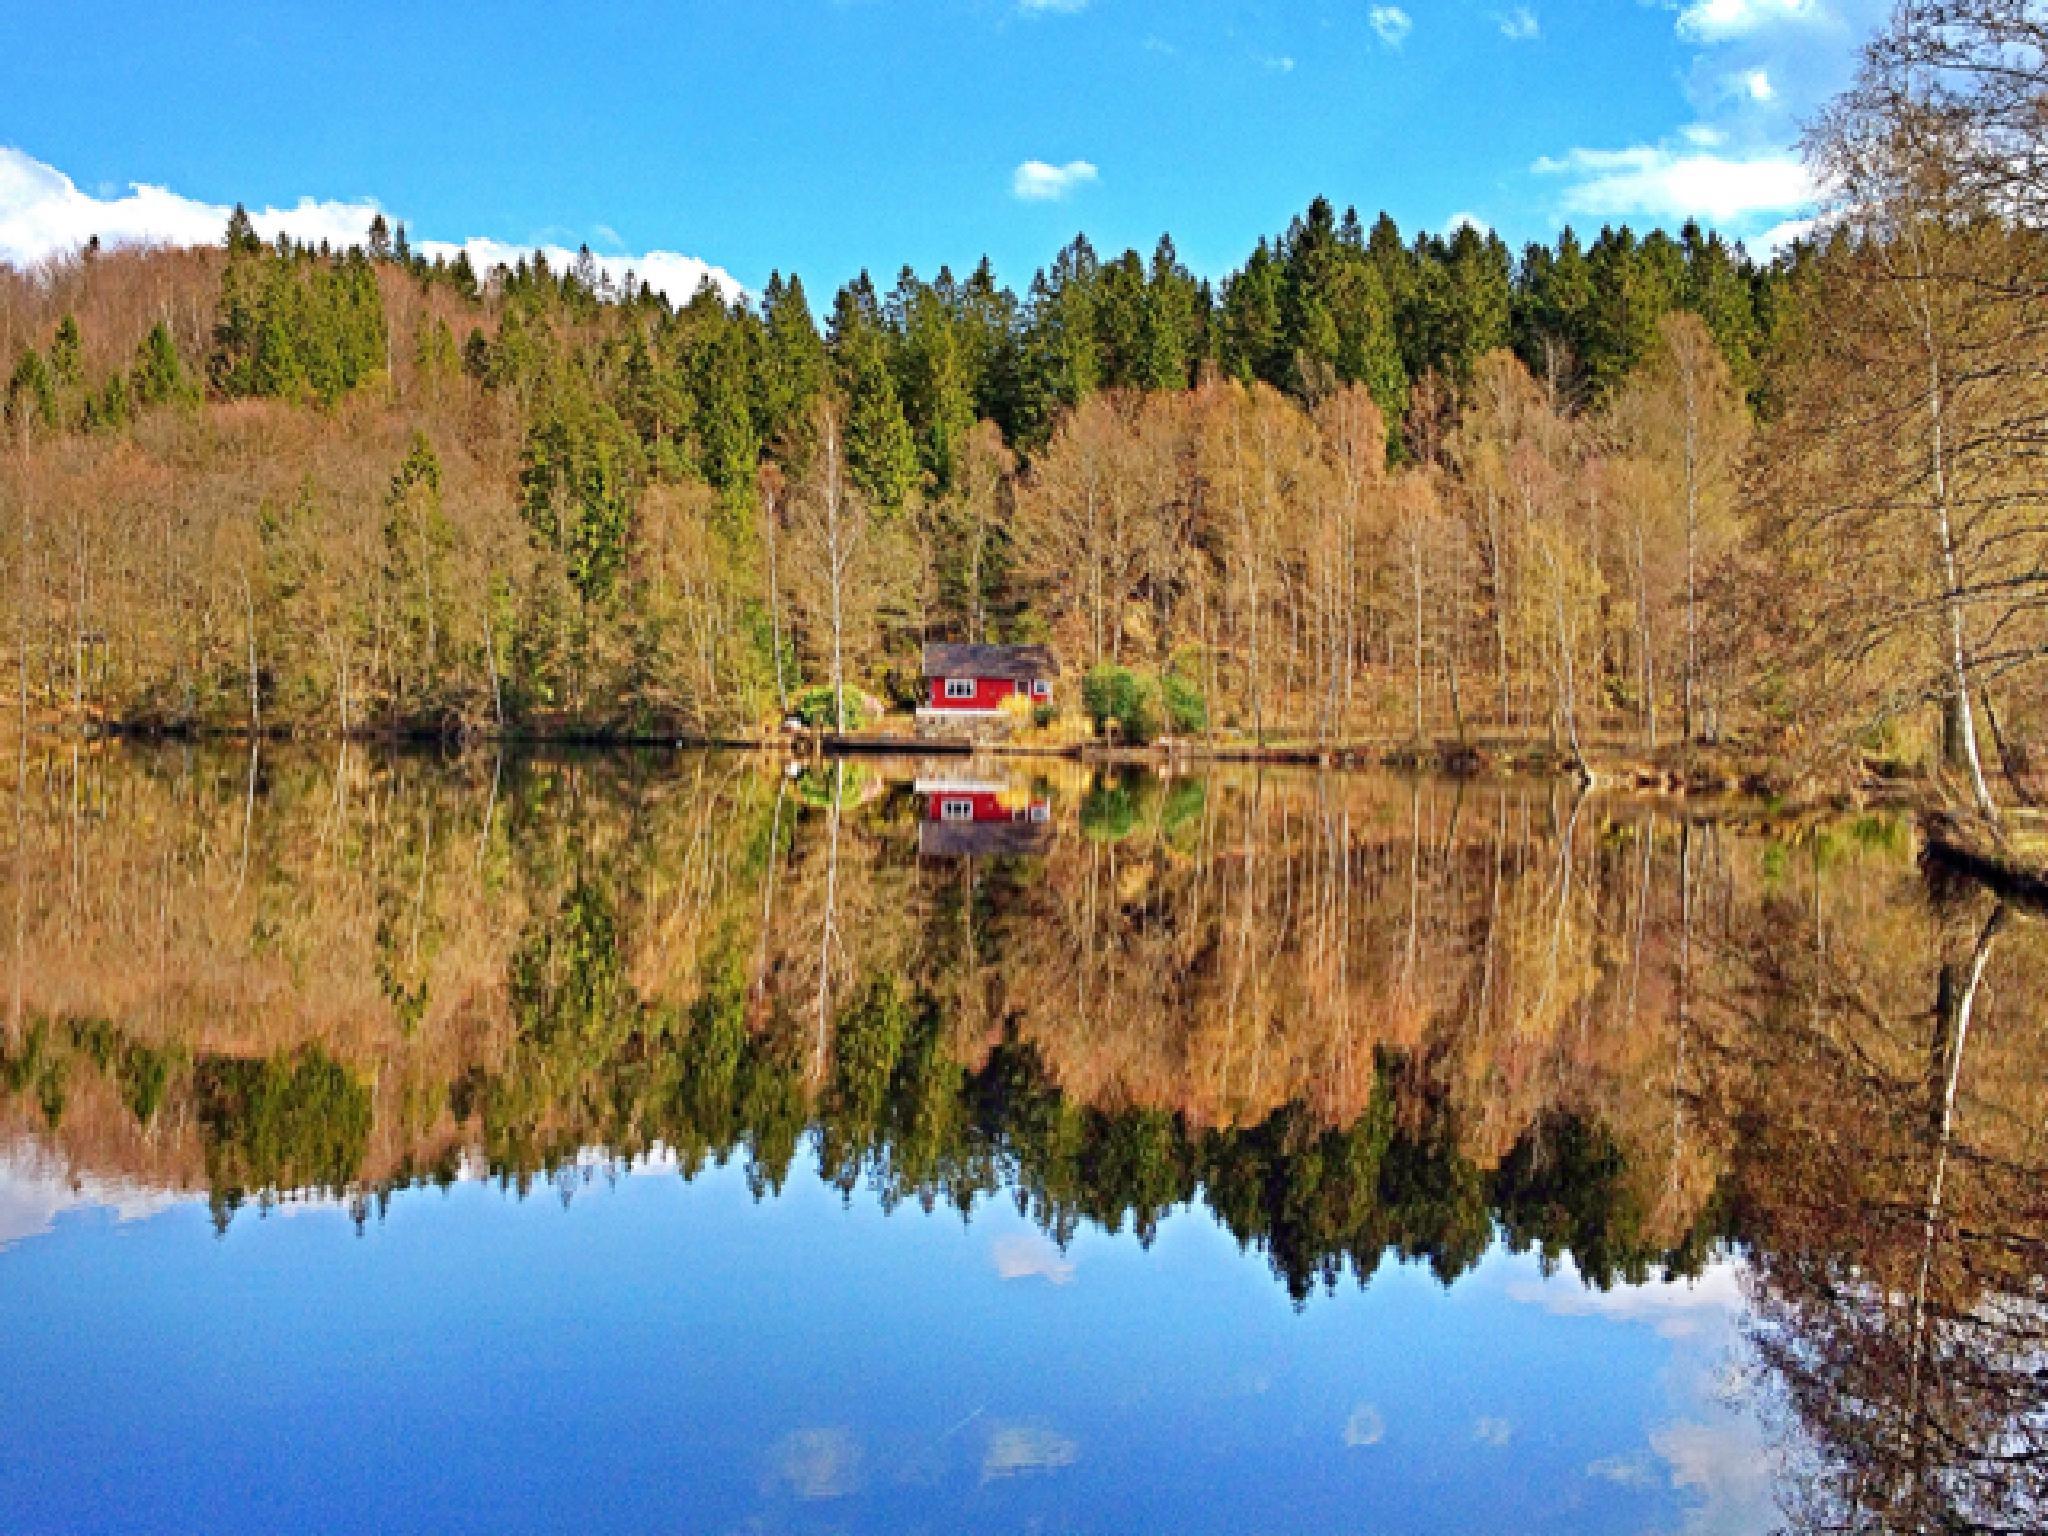 Halland Sweden by Johan Meding